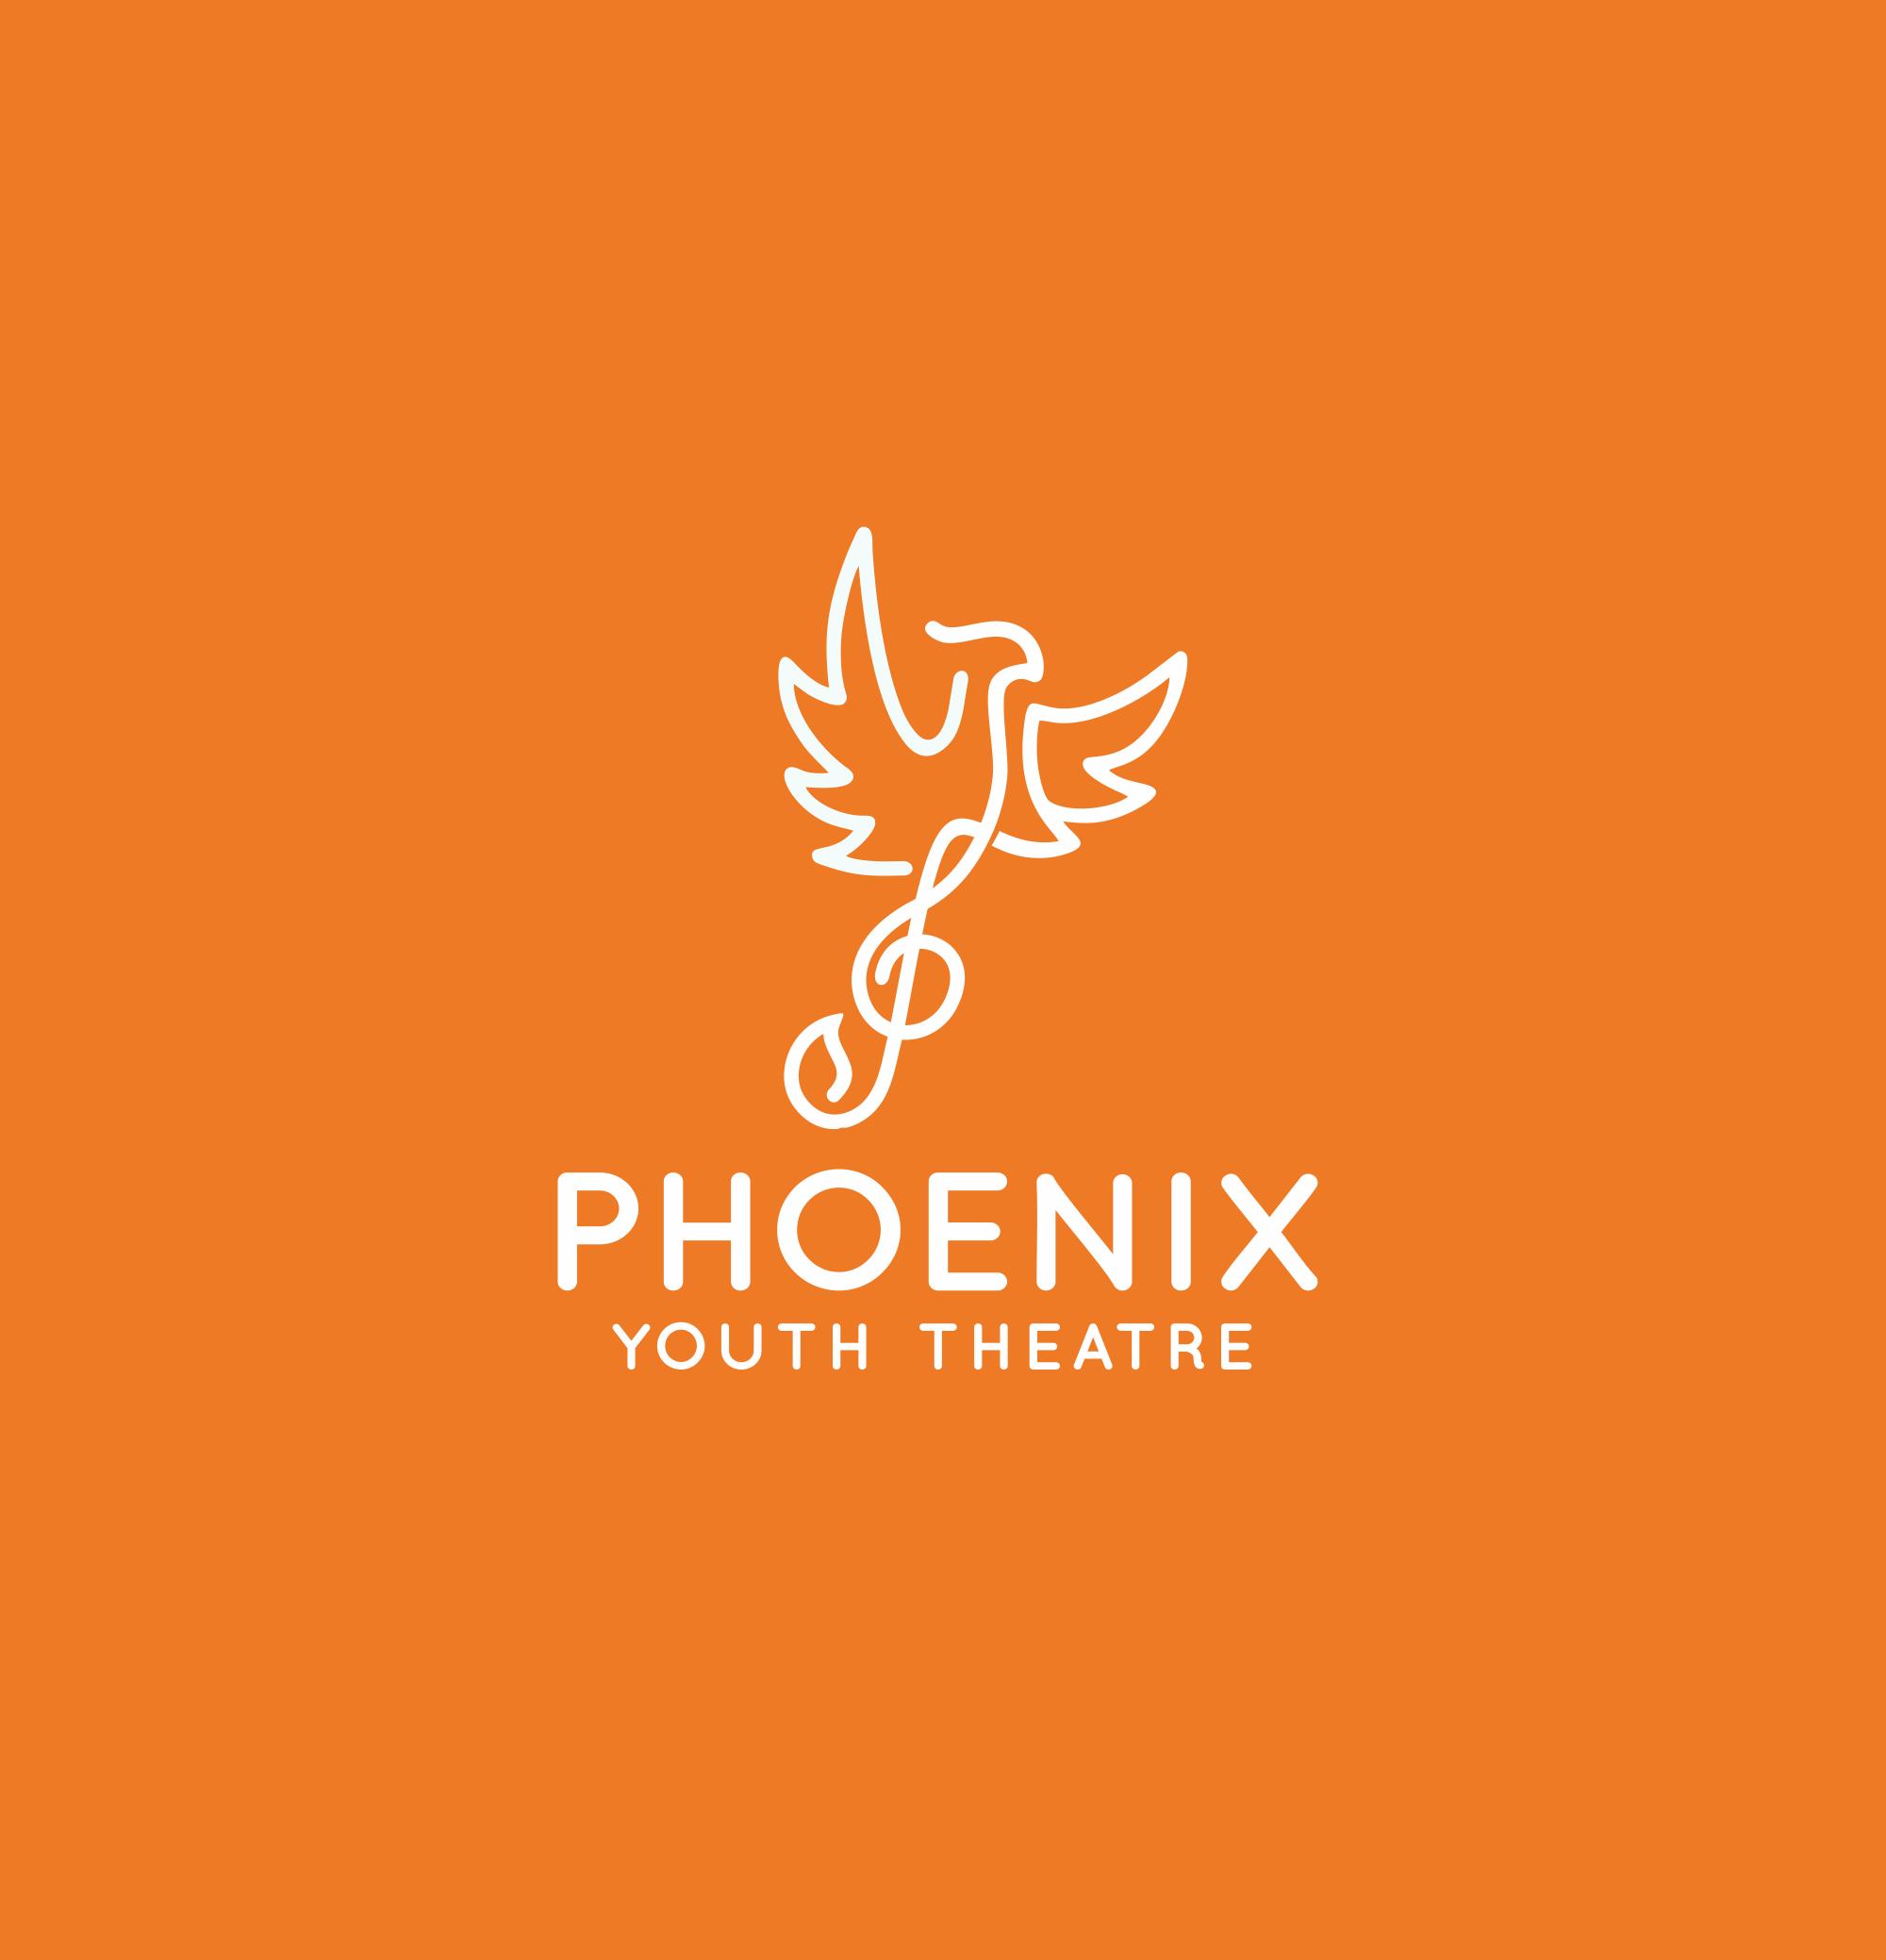 Design a cool contemporary/hip/modern/cute logo for Theatre School